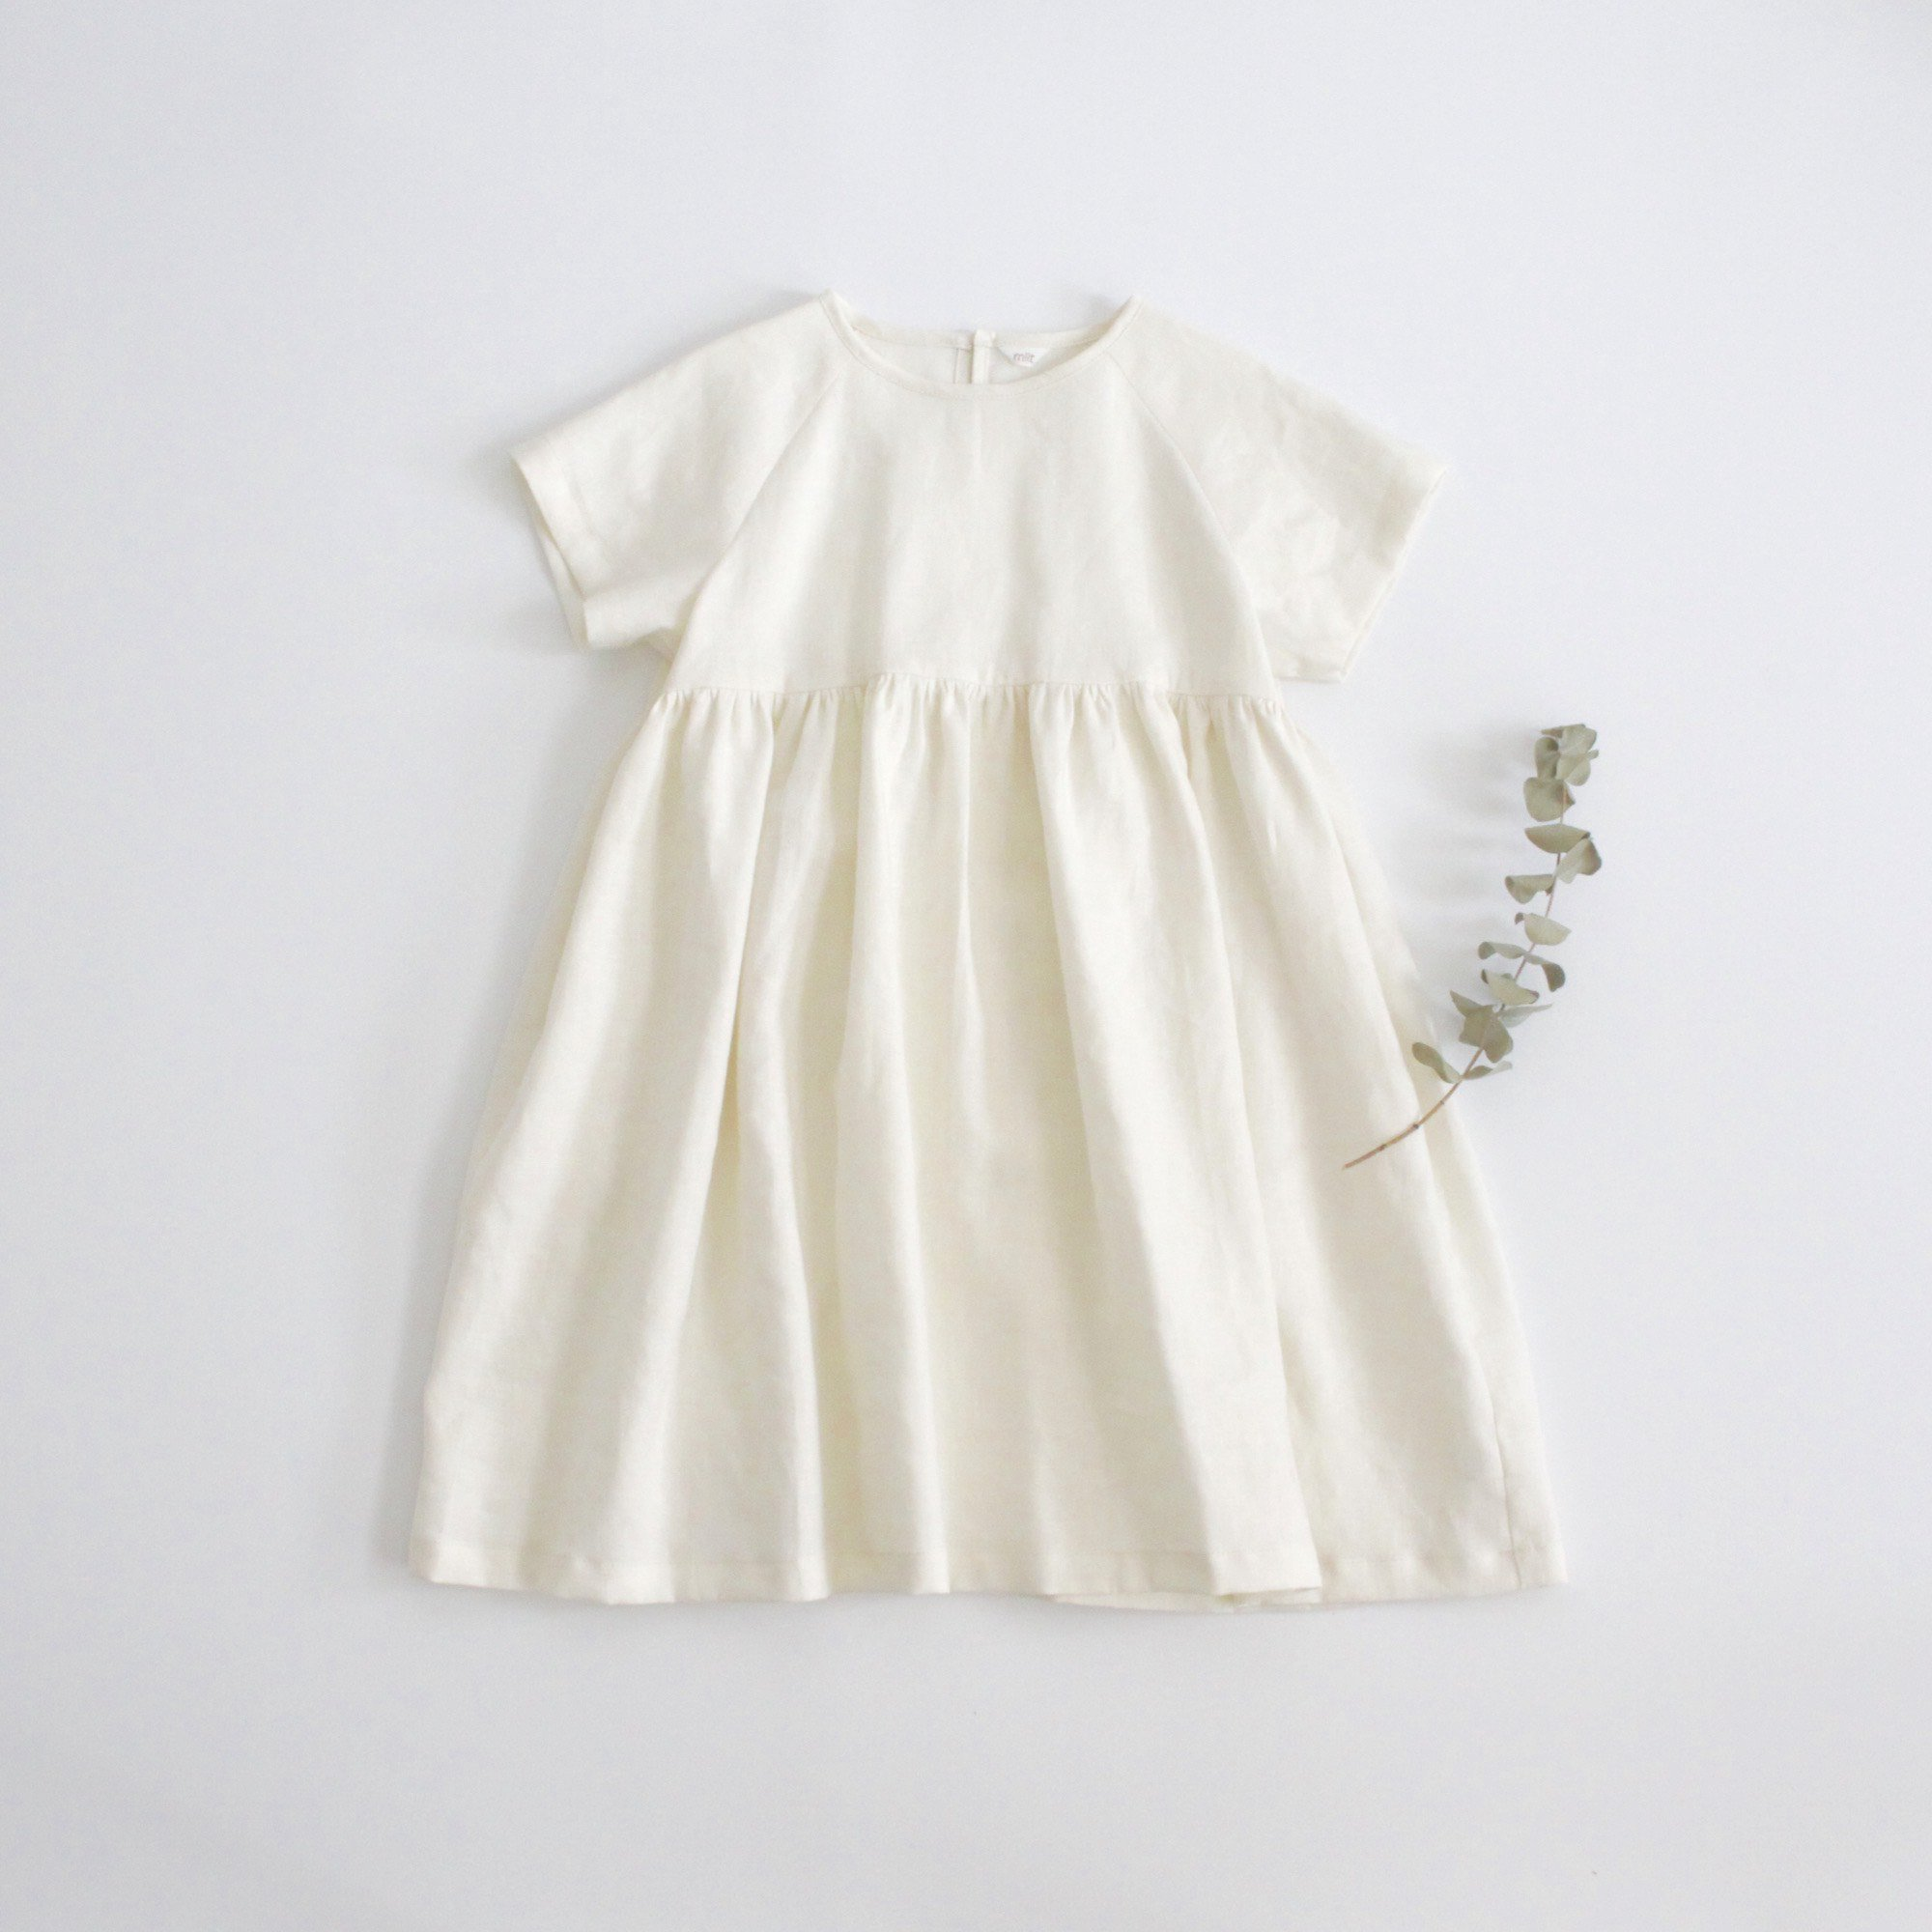 <img class='new_mark_img1' src='https://img.shop-pro.jp/img/new/icons14.gif' style='border:none;display:inline;margin:0px;padding:0px;width:auto;' />Linen raglan sleeve dress 110